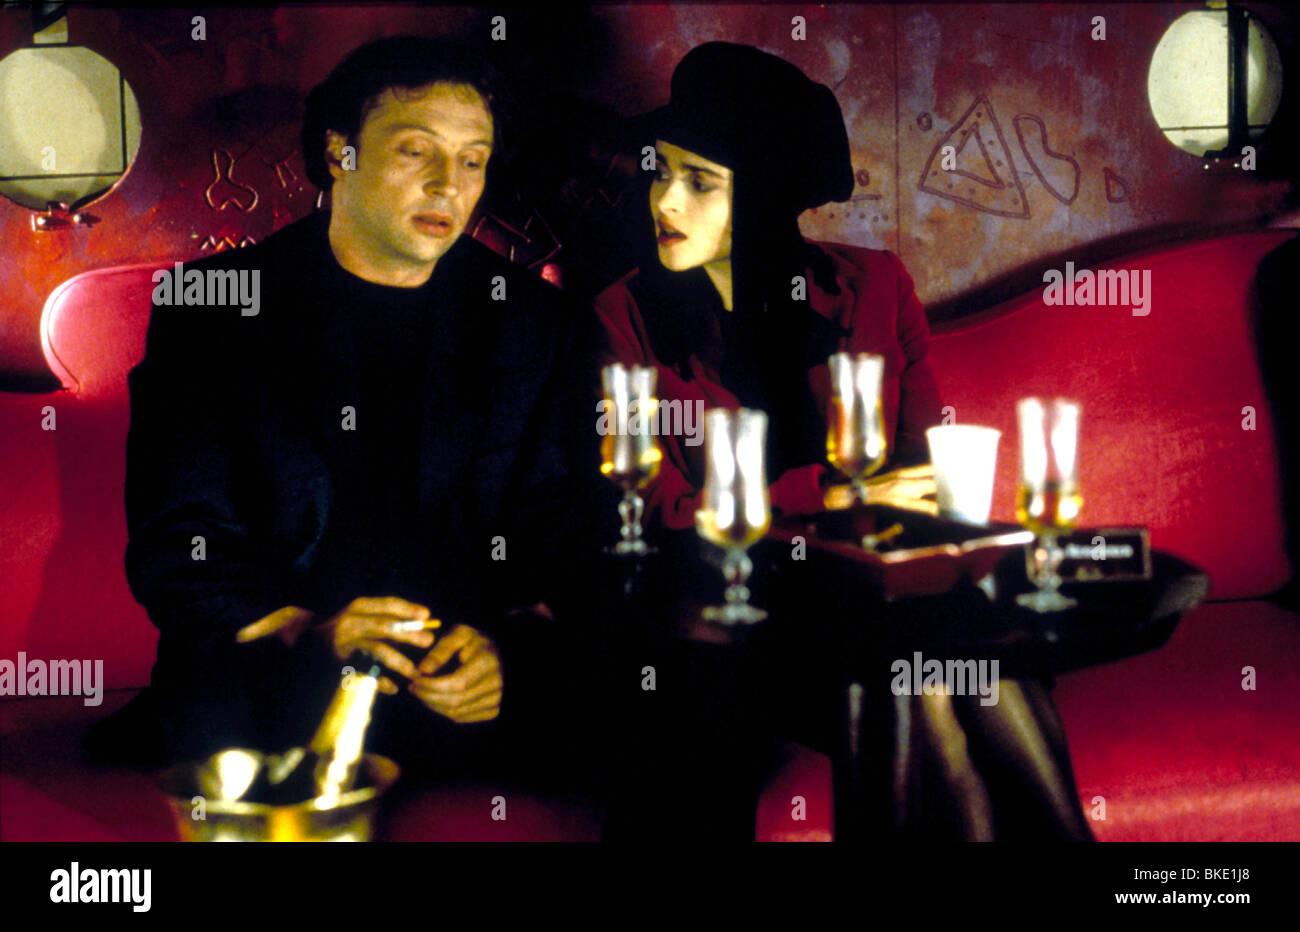 d5d163f7845 PORTRAITS CHINOIS (1996) SHADOW PLAY (ALT) JEAN-PHILIPPE ECOFFEY, HELENA  BONHAM CARTER PORT 063